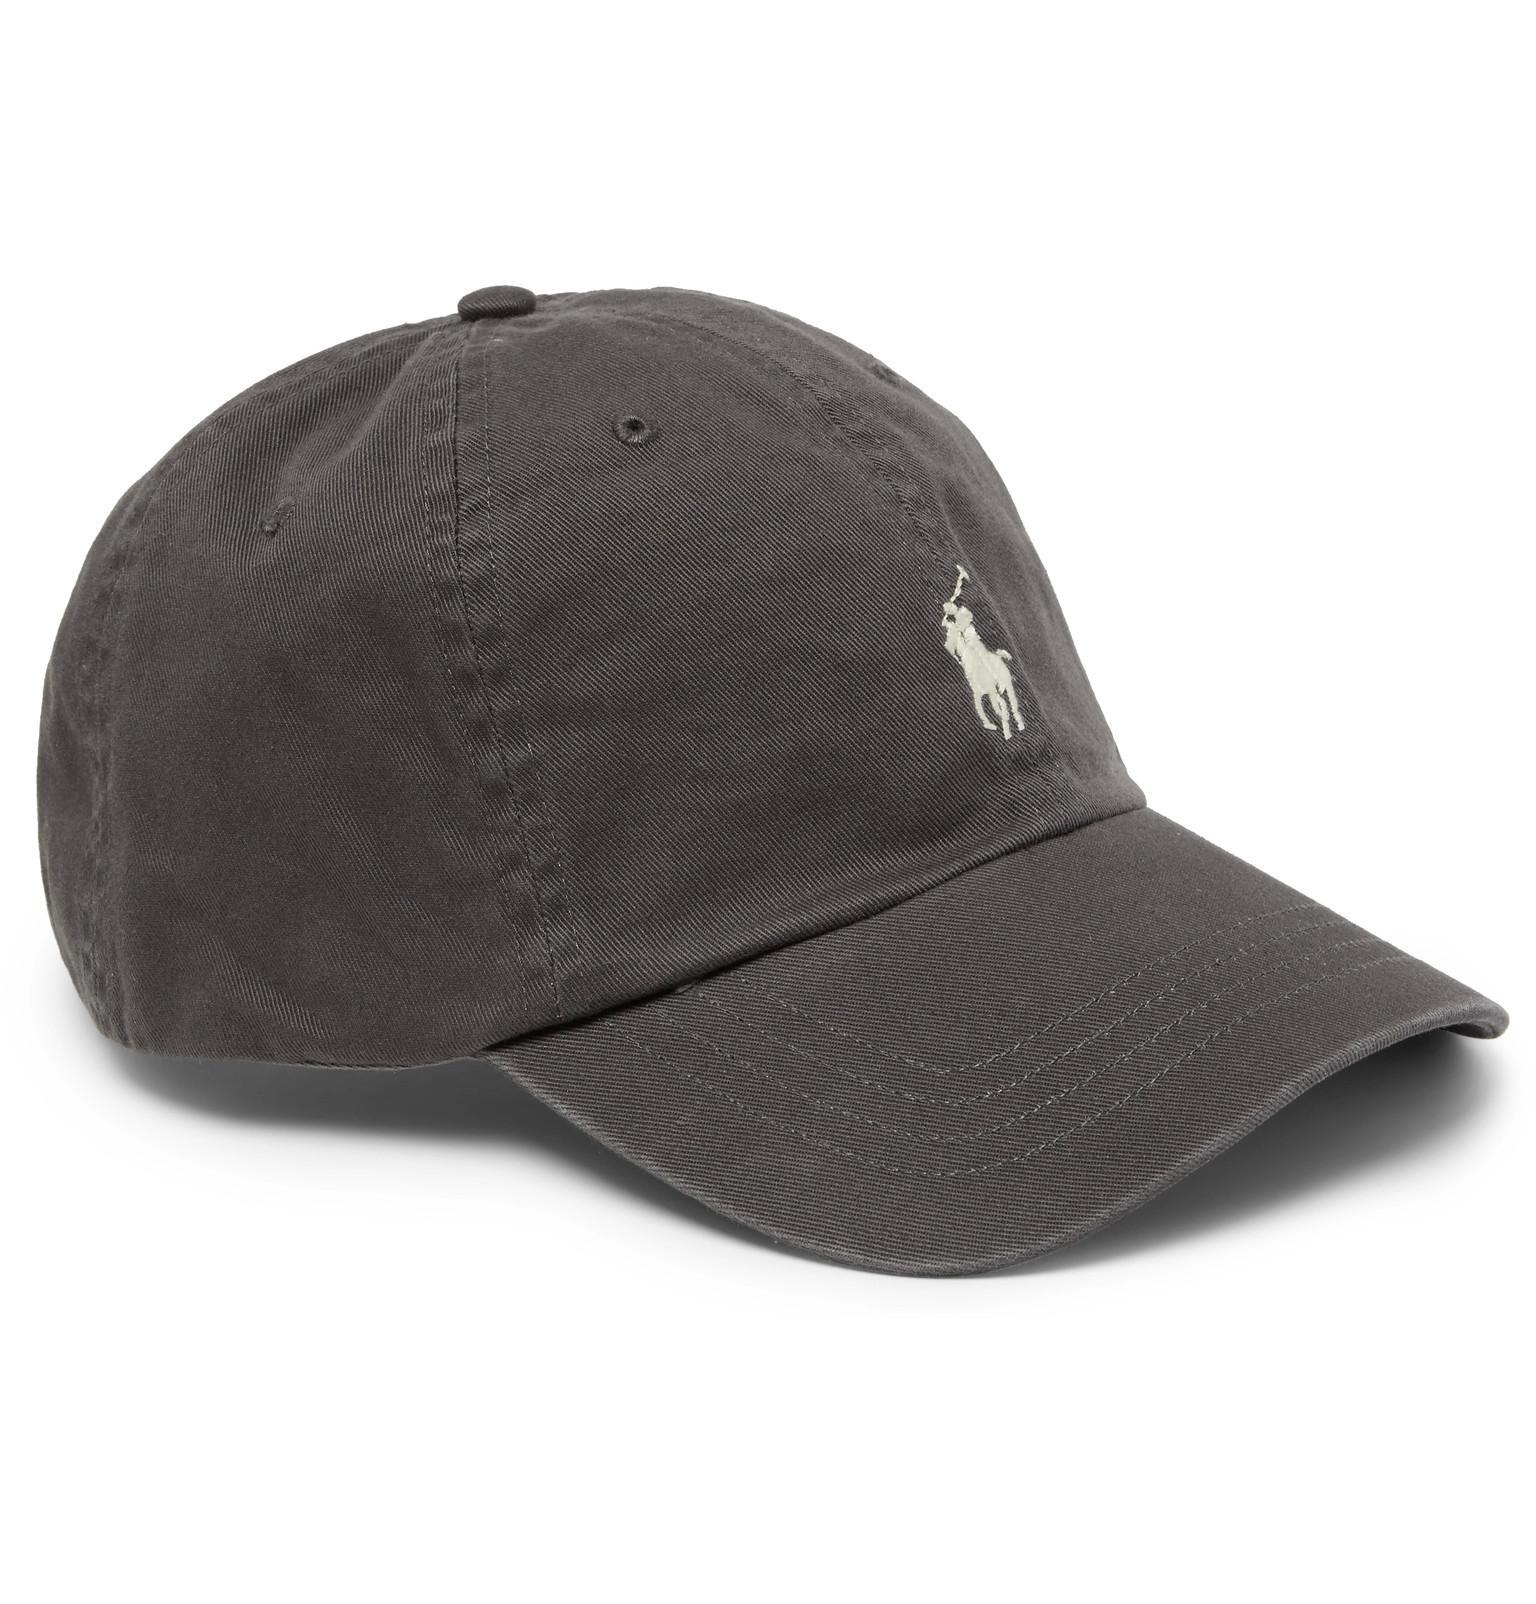 a3f97f1acae05 Lyst - Polo Ralph Lauren Cotton-twill Baseball Cap in Gray for Men